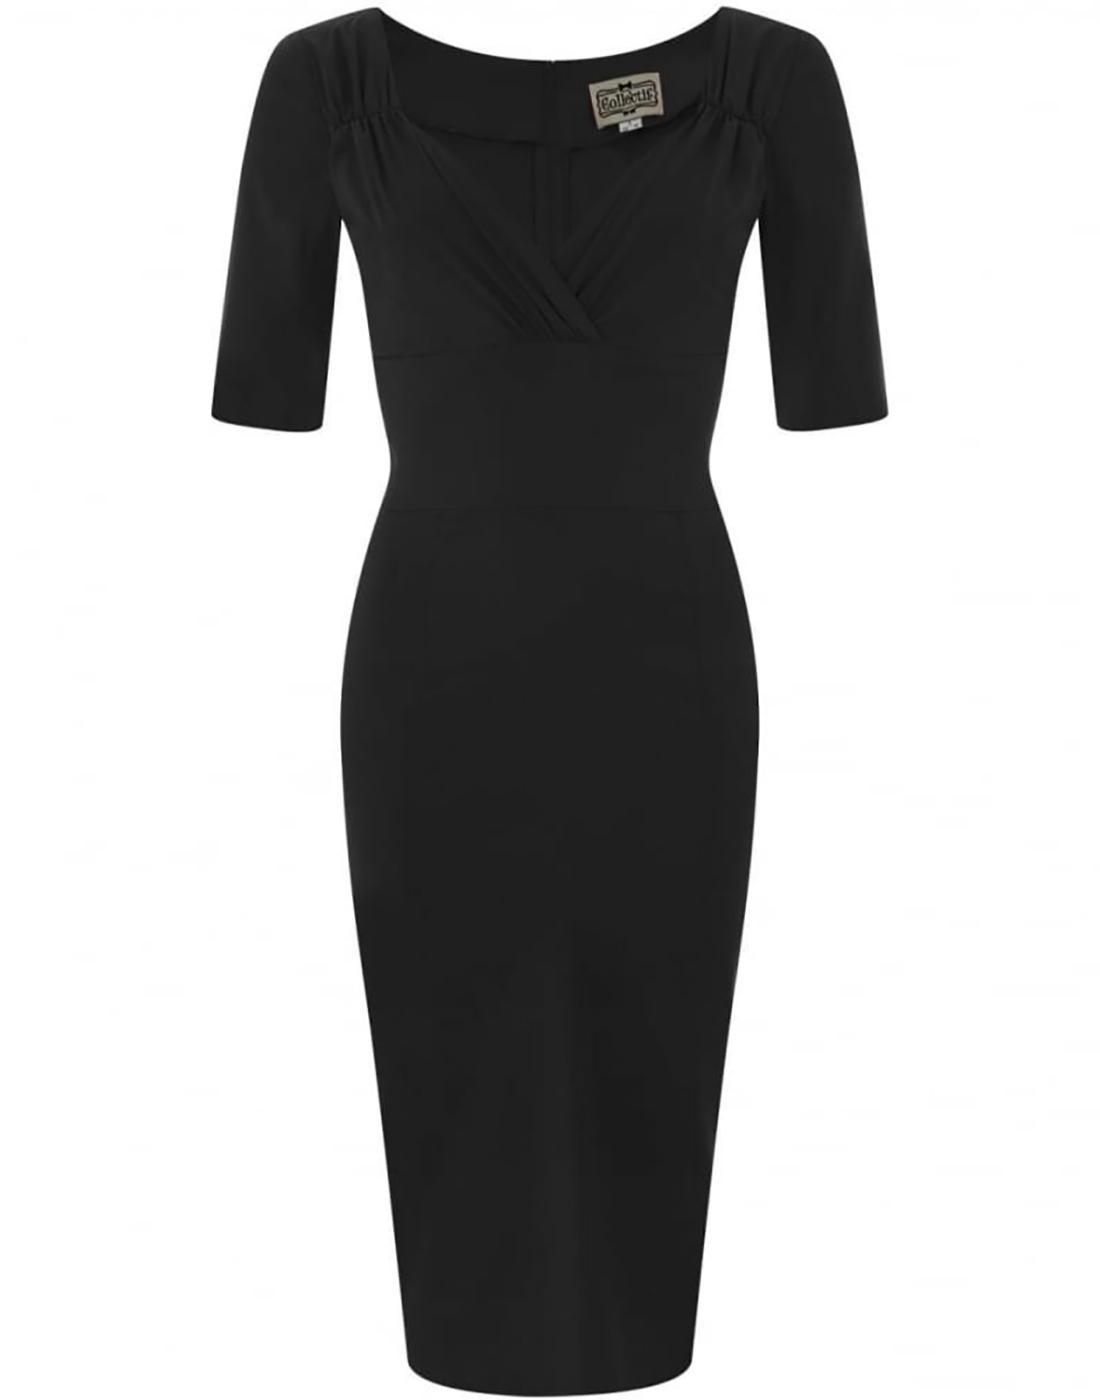 Trixie COLLECTIF Retro Vintage Black Pencil Dress